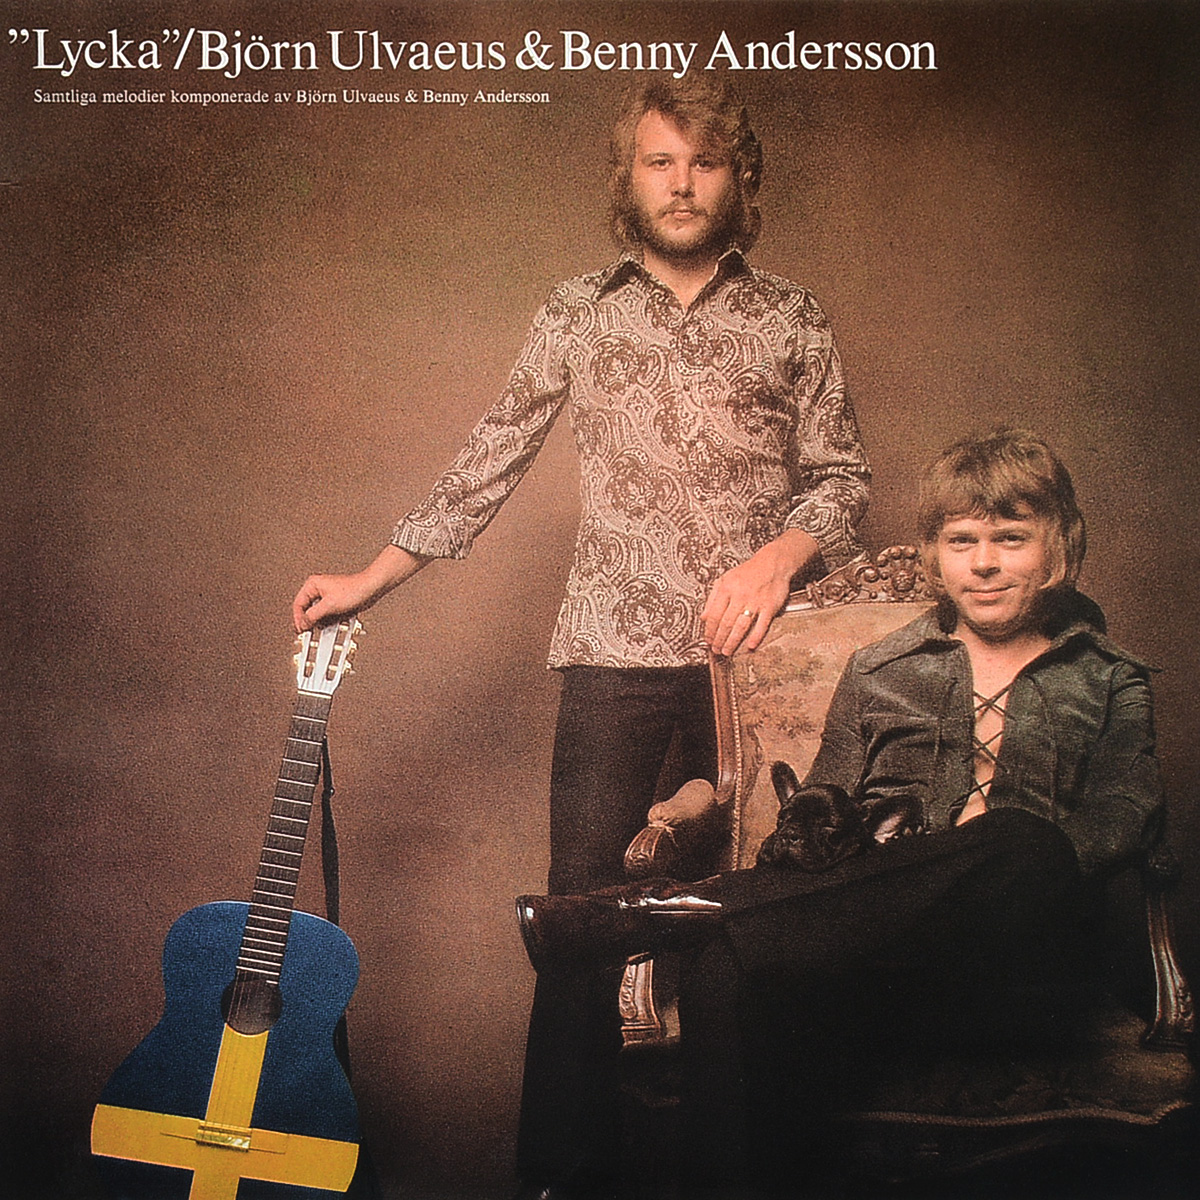 Бенни Андерссон Benny Andersson, Bjorn Ulvaeus. Lycka (Coloured Vinyl) (LP) бенни бенасси grand collection benny benassi